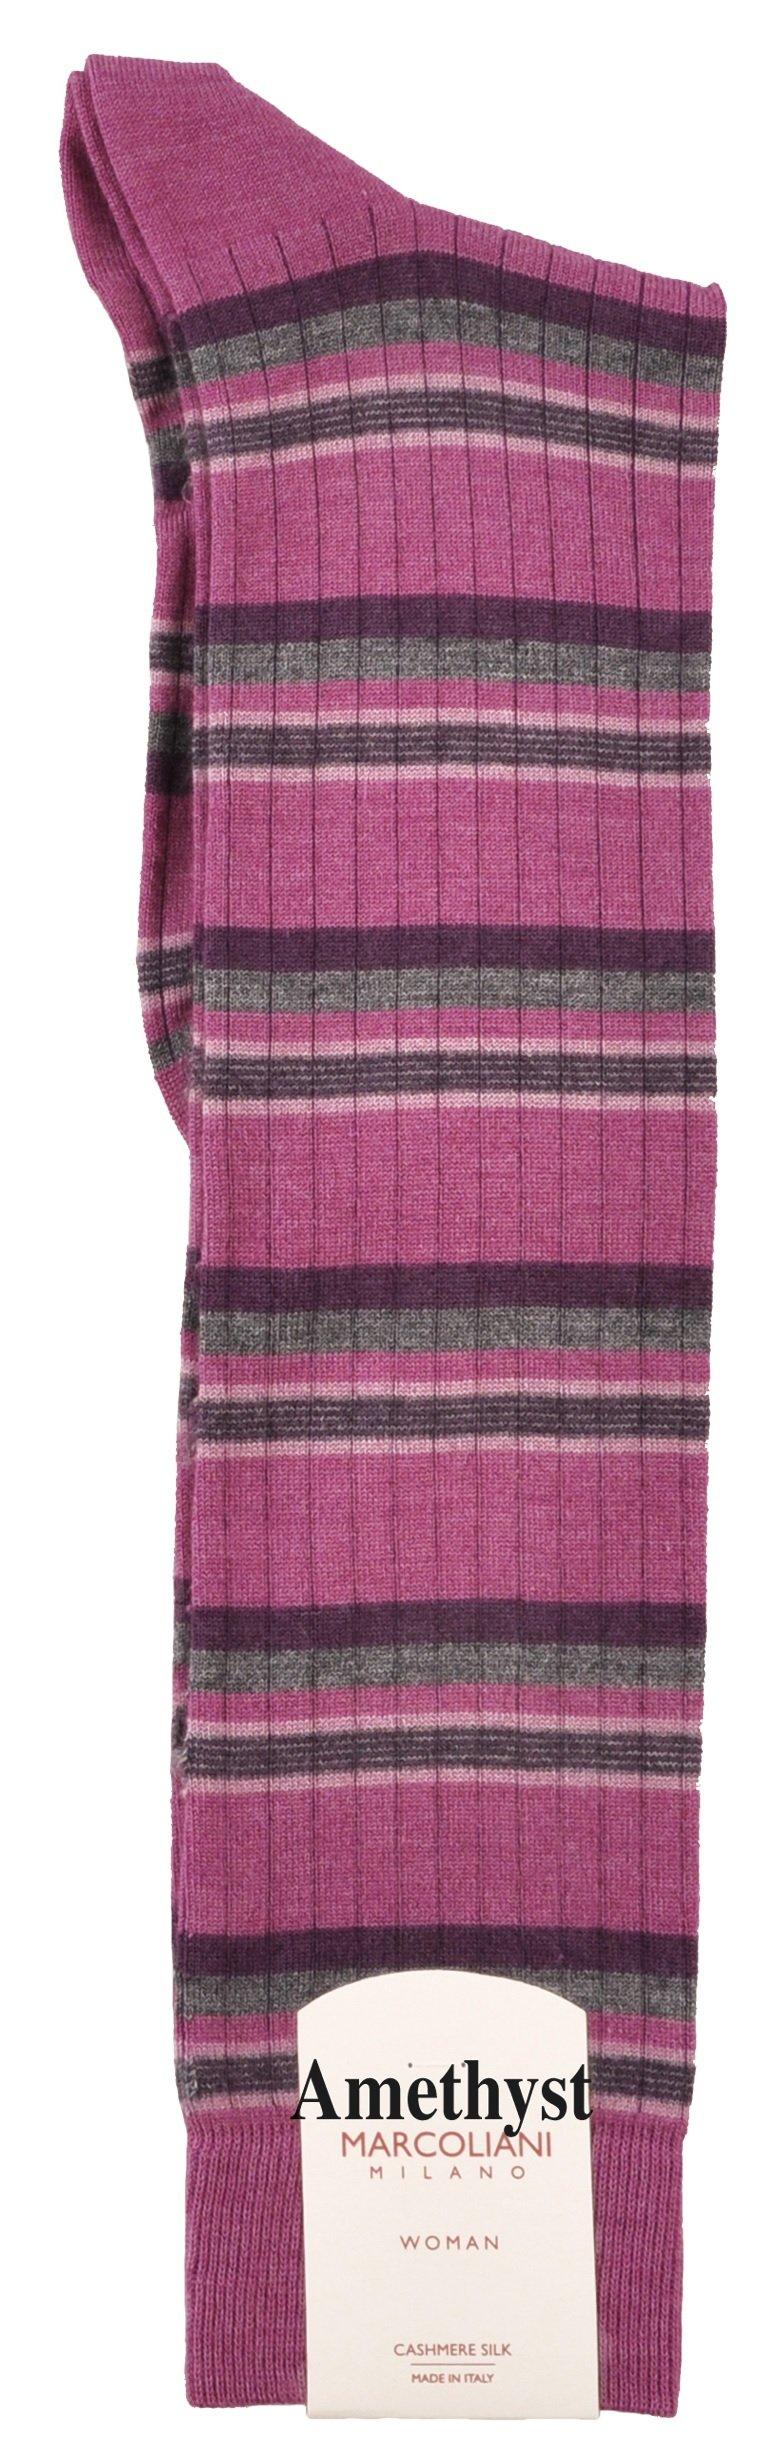 LIMITED EDITION Knee-High Cashmere & Silk Socks Chic Fashion Stripe - One Pair Amethyst